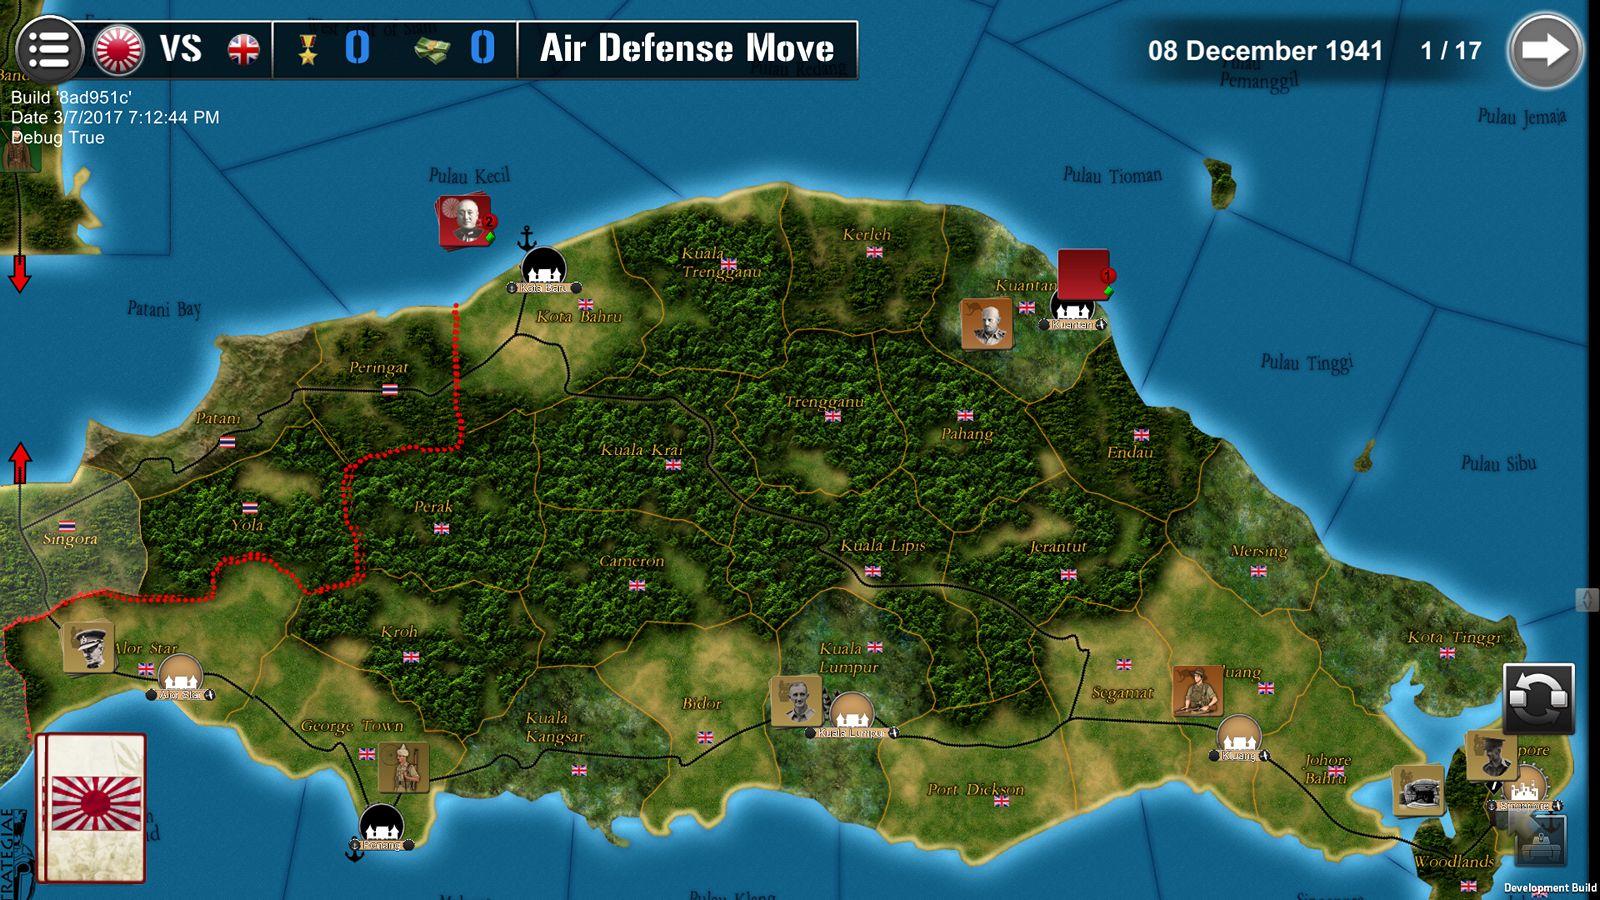 War Across the World Wars-across-the-world-0317-Malaya1941_Map_Screen4